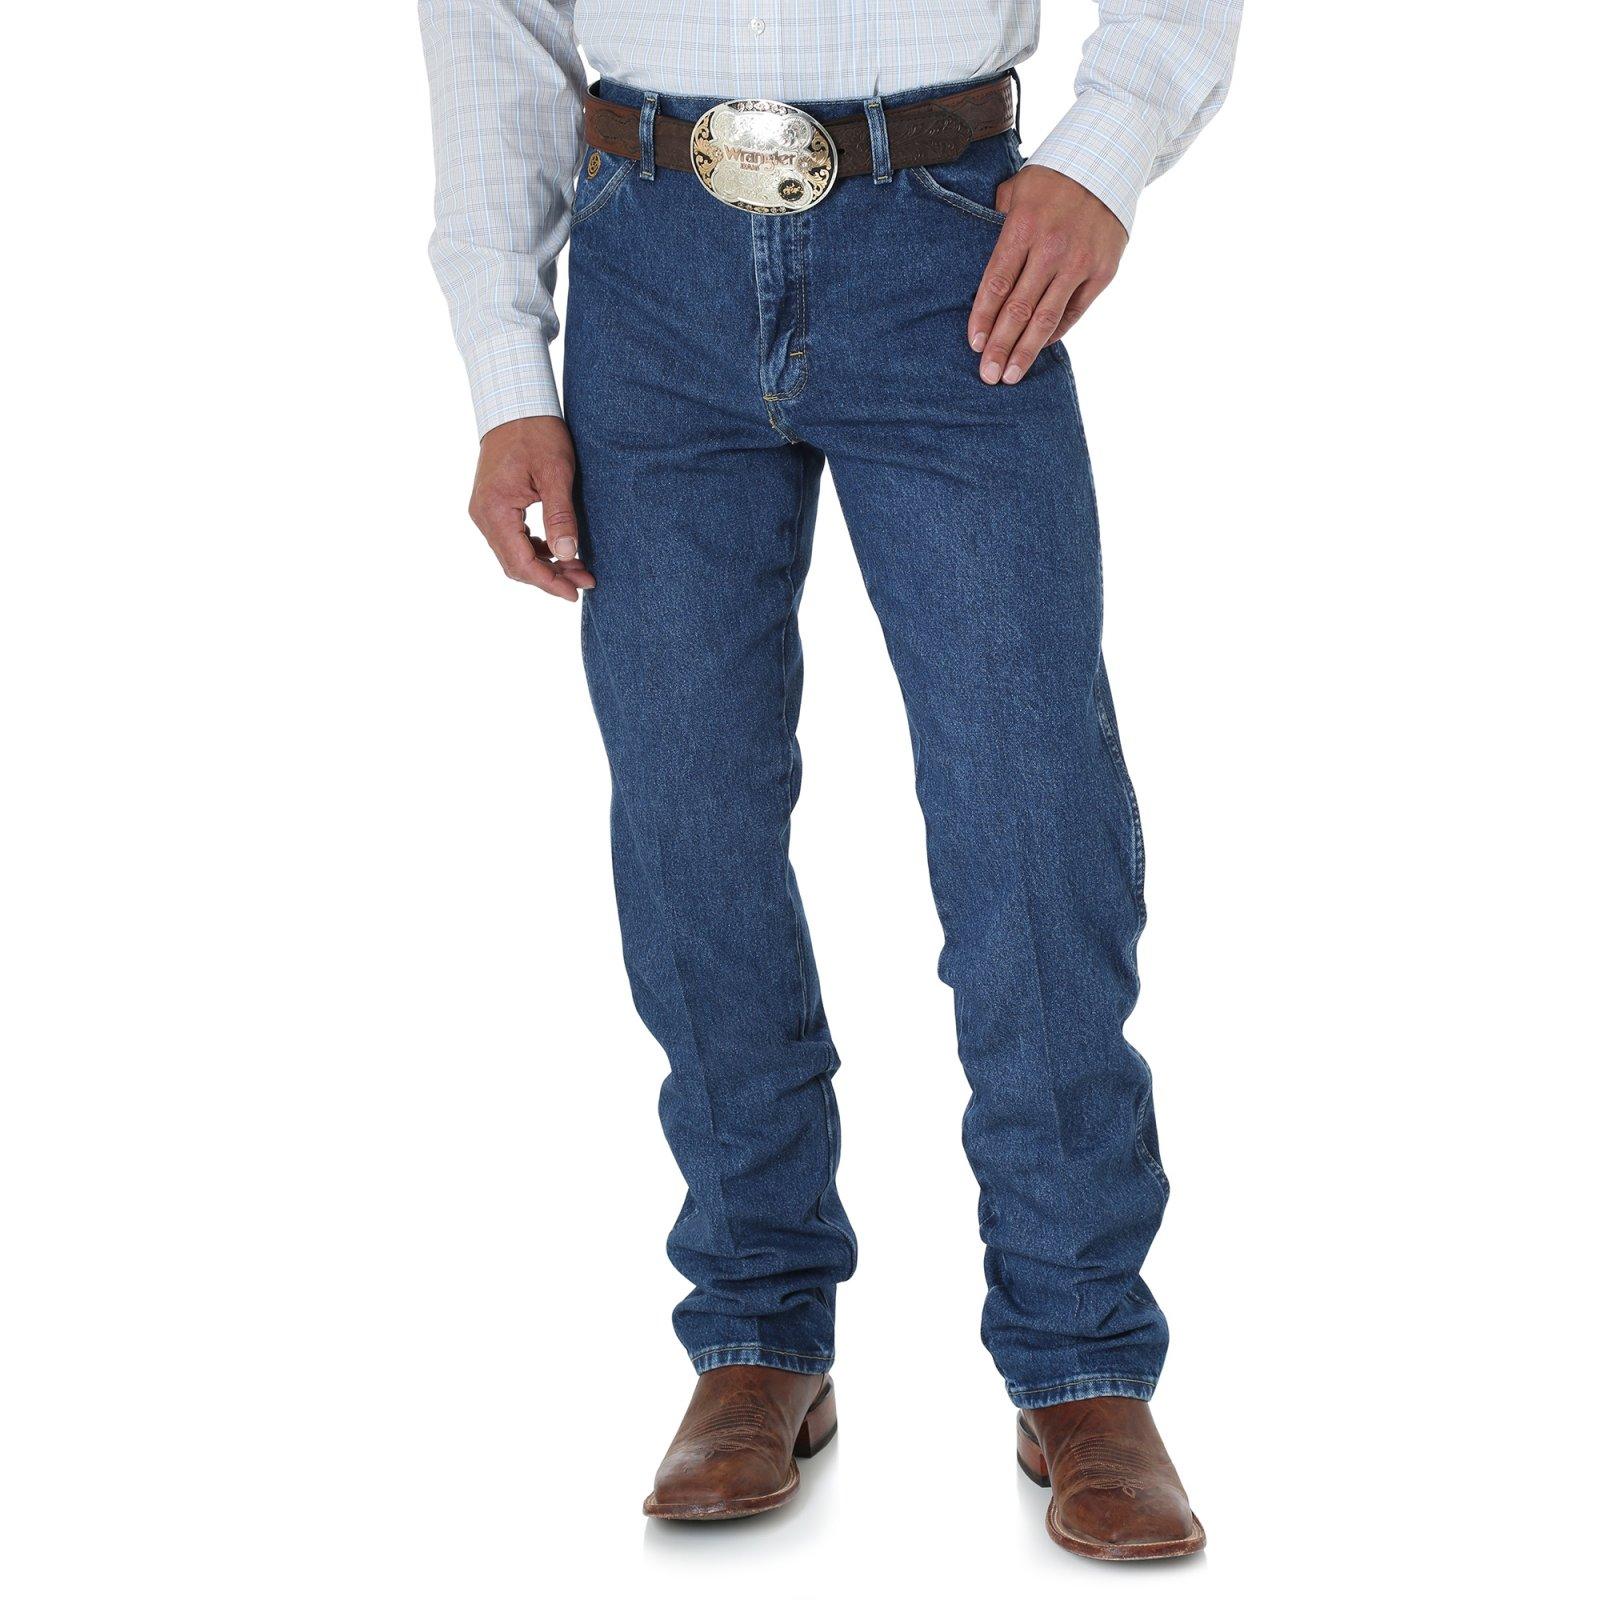 Men's George Strait Original Cowboy Cut Jean from Wrangler